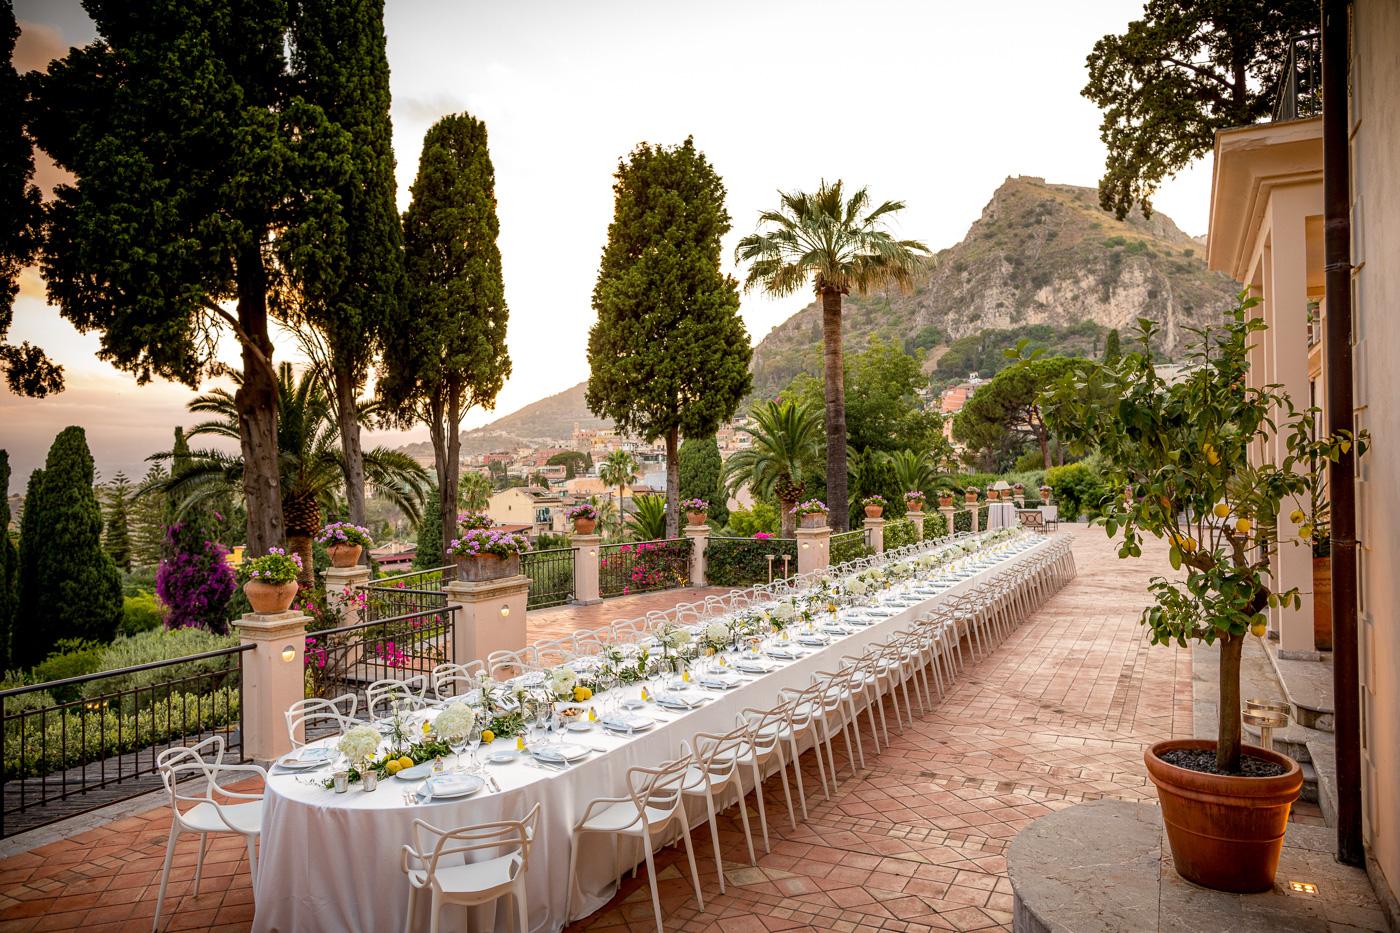 Matrimonio Irlandese Taormina_fotografo_matrimonio-belmond-timeo-tavolo-imperiale-magnifico-stupendo